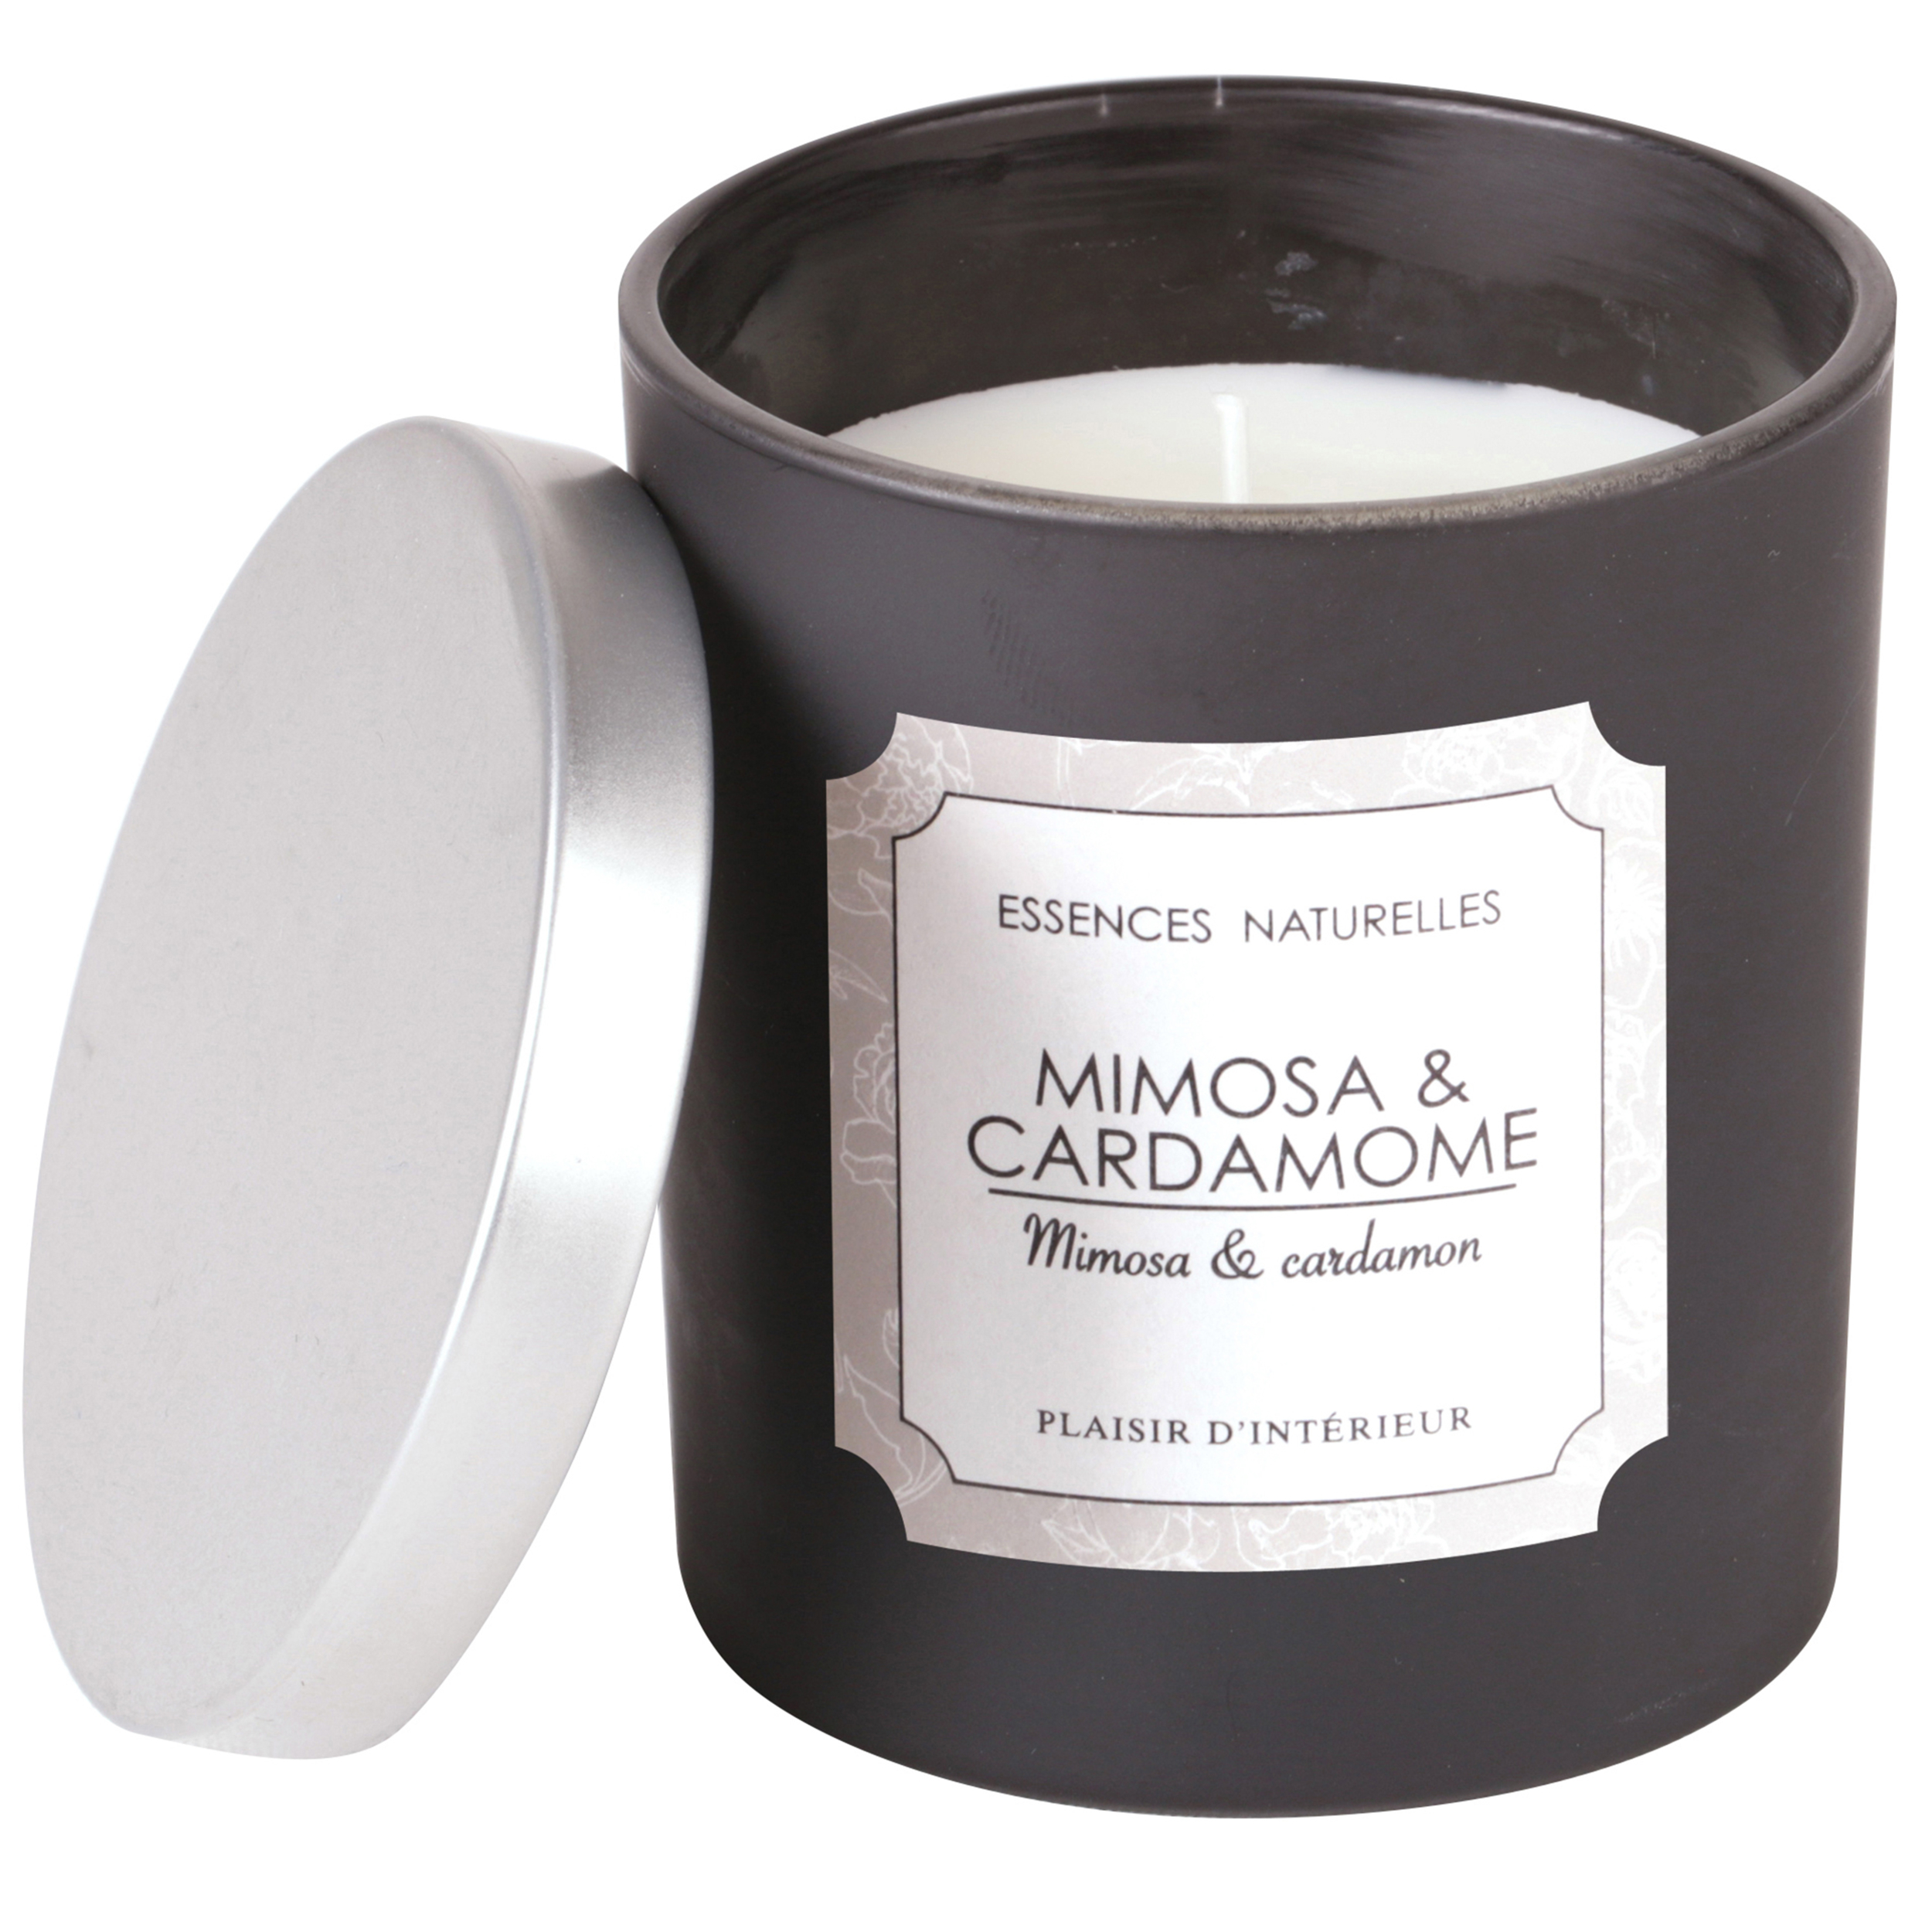 BOUGIE PARFUMEE MIMOSA & CARDAMOME (S)